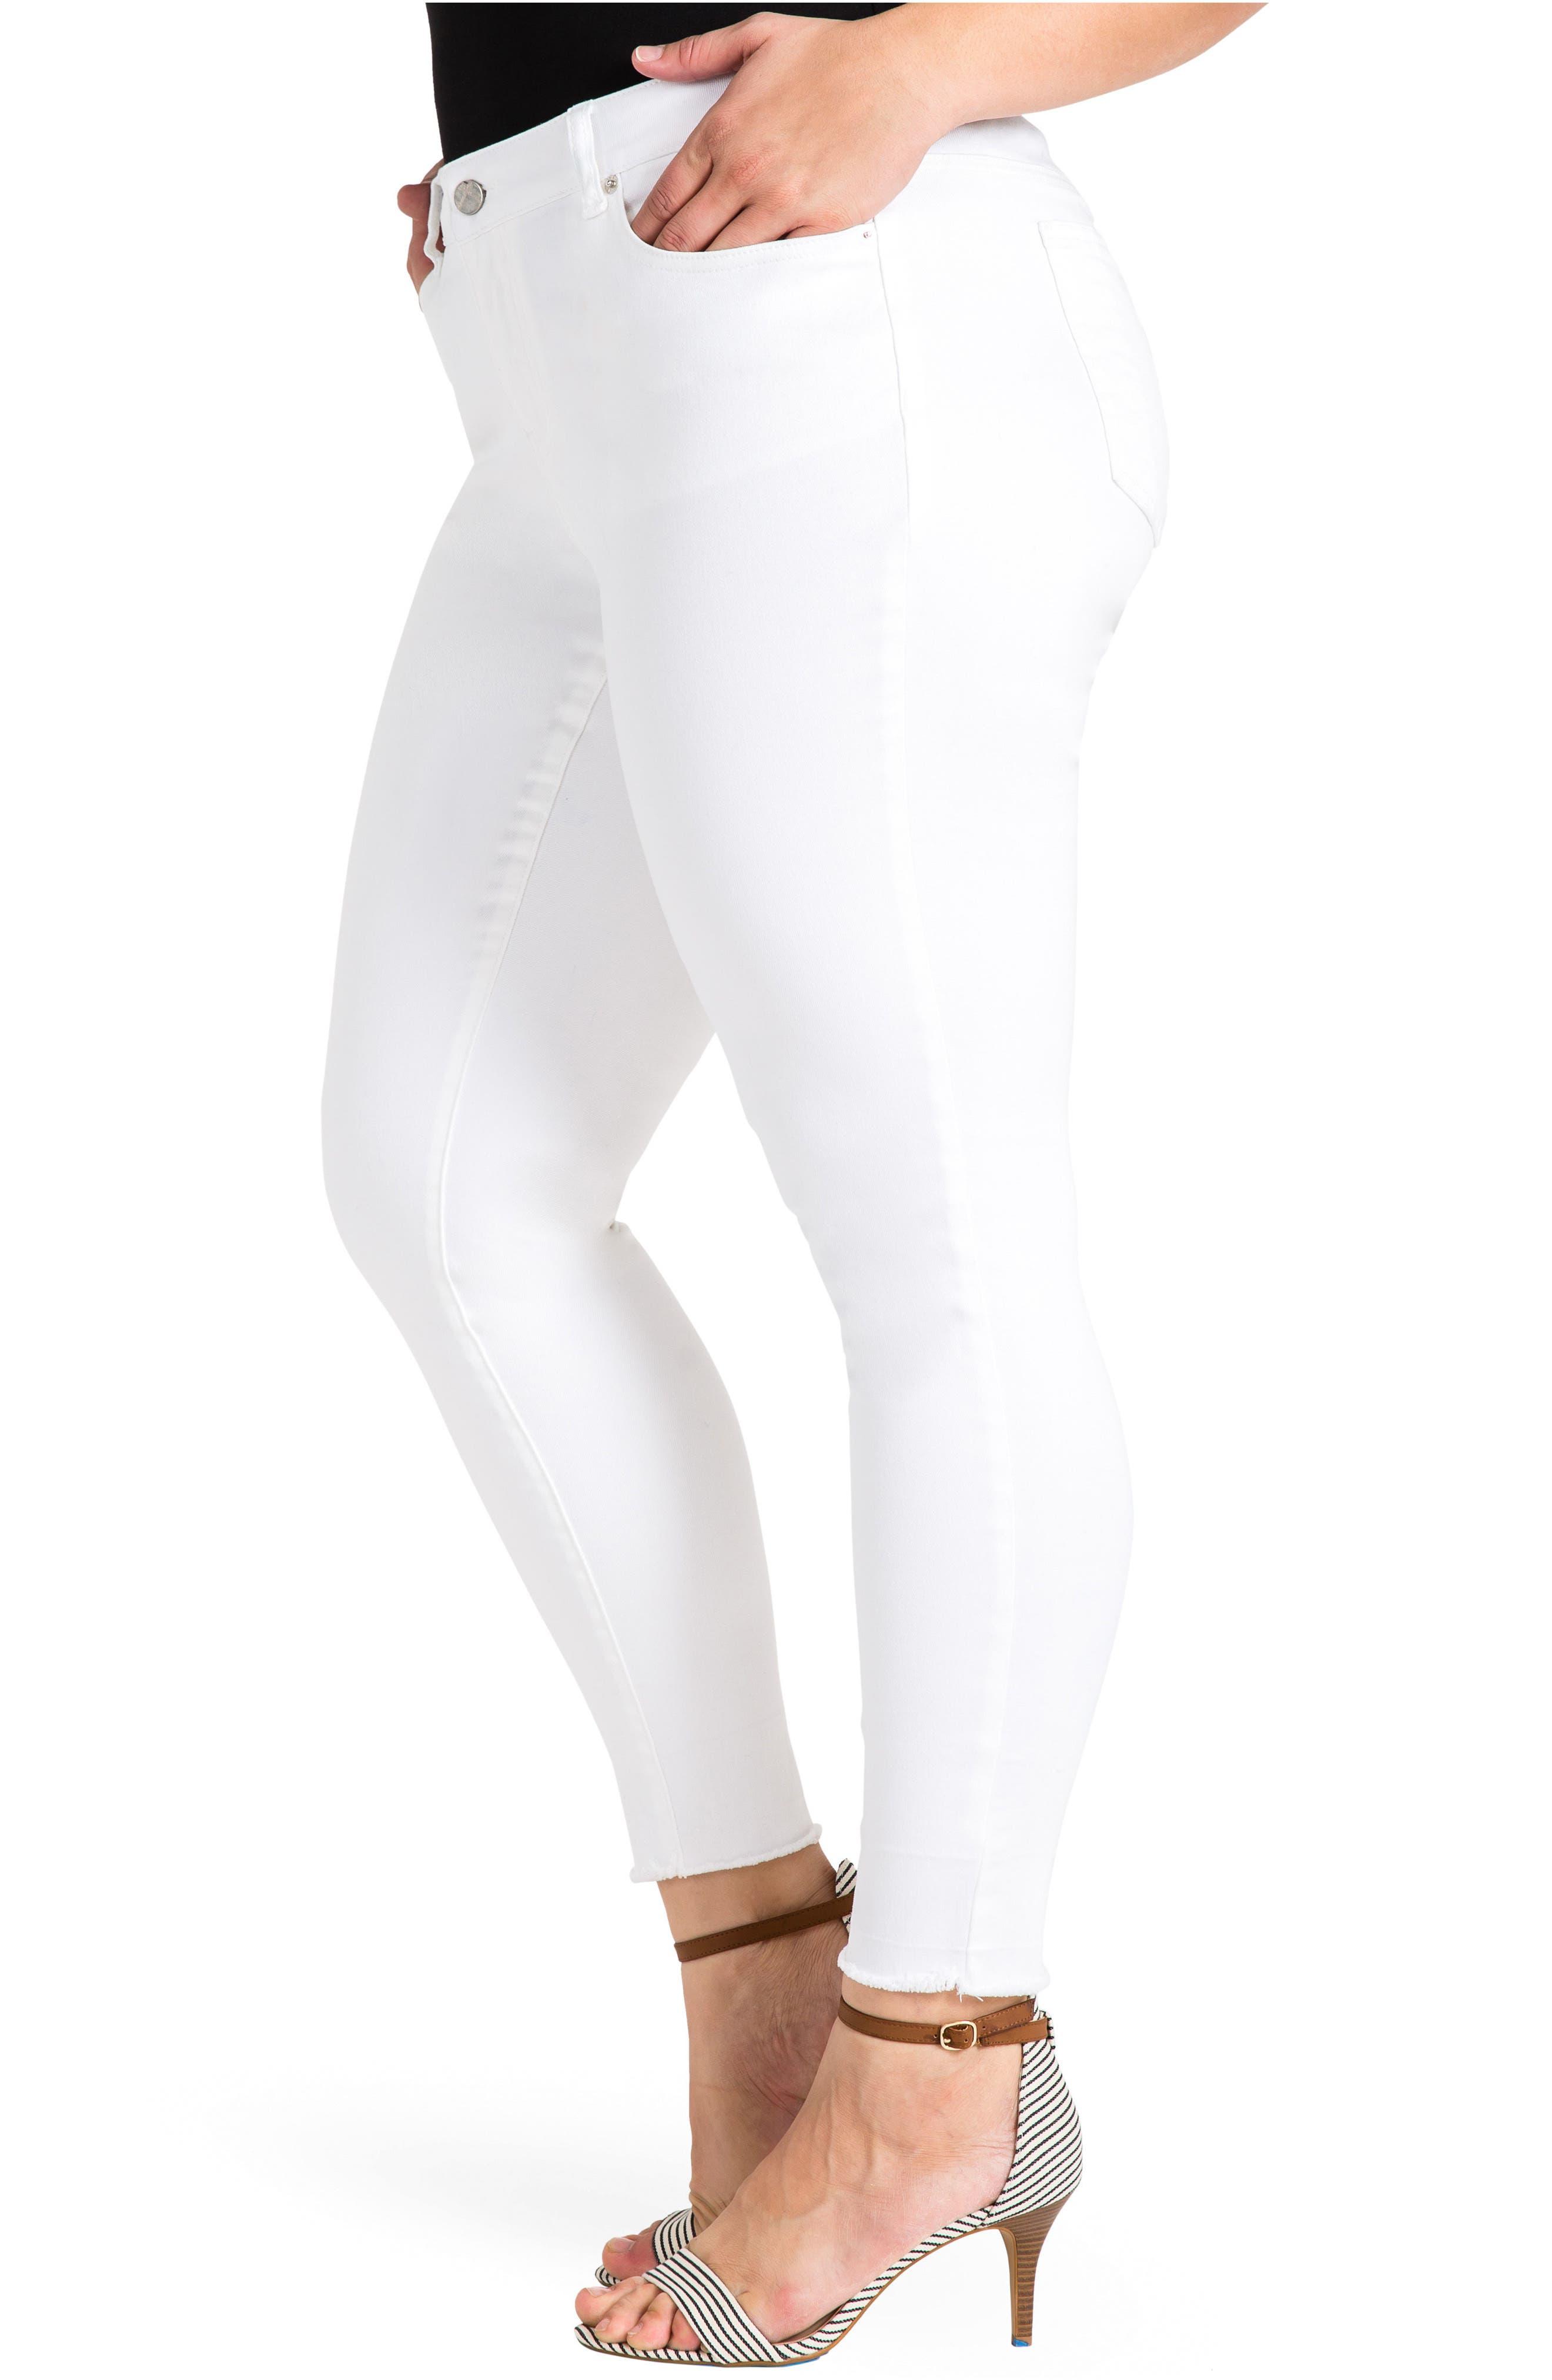 Virginia Ankle Skinny Jeans,                             Alternate thumbnail 3, color,                             3087Powderwt - White